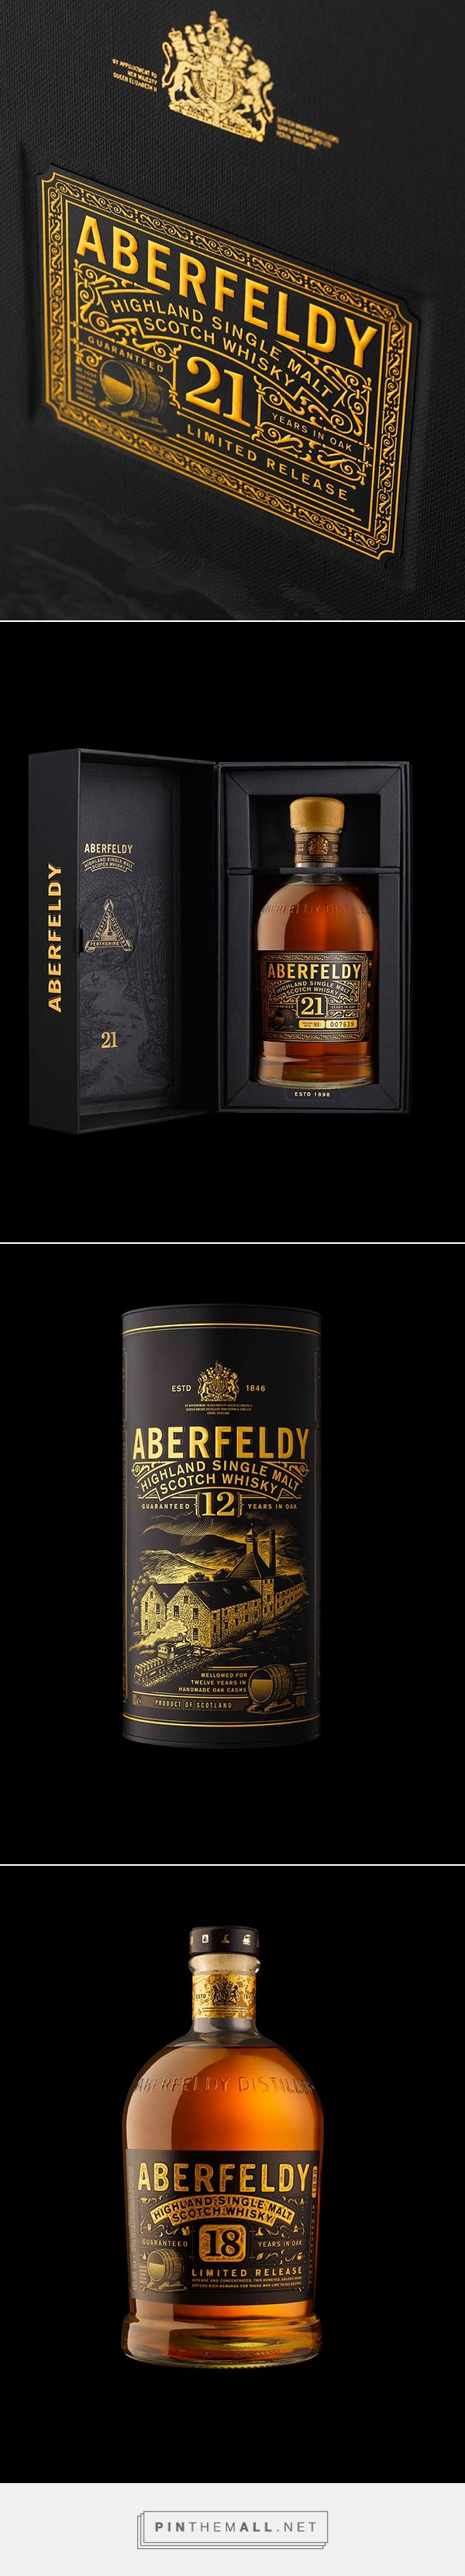 Aberfeldy Single Malt Scotch Whisky